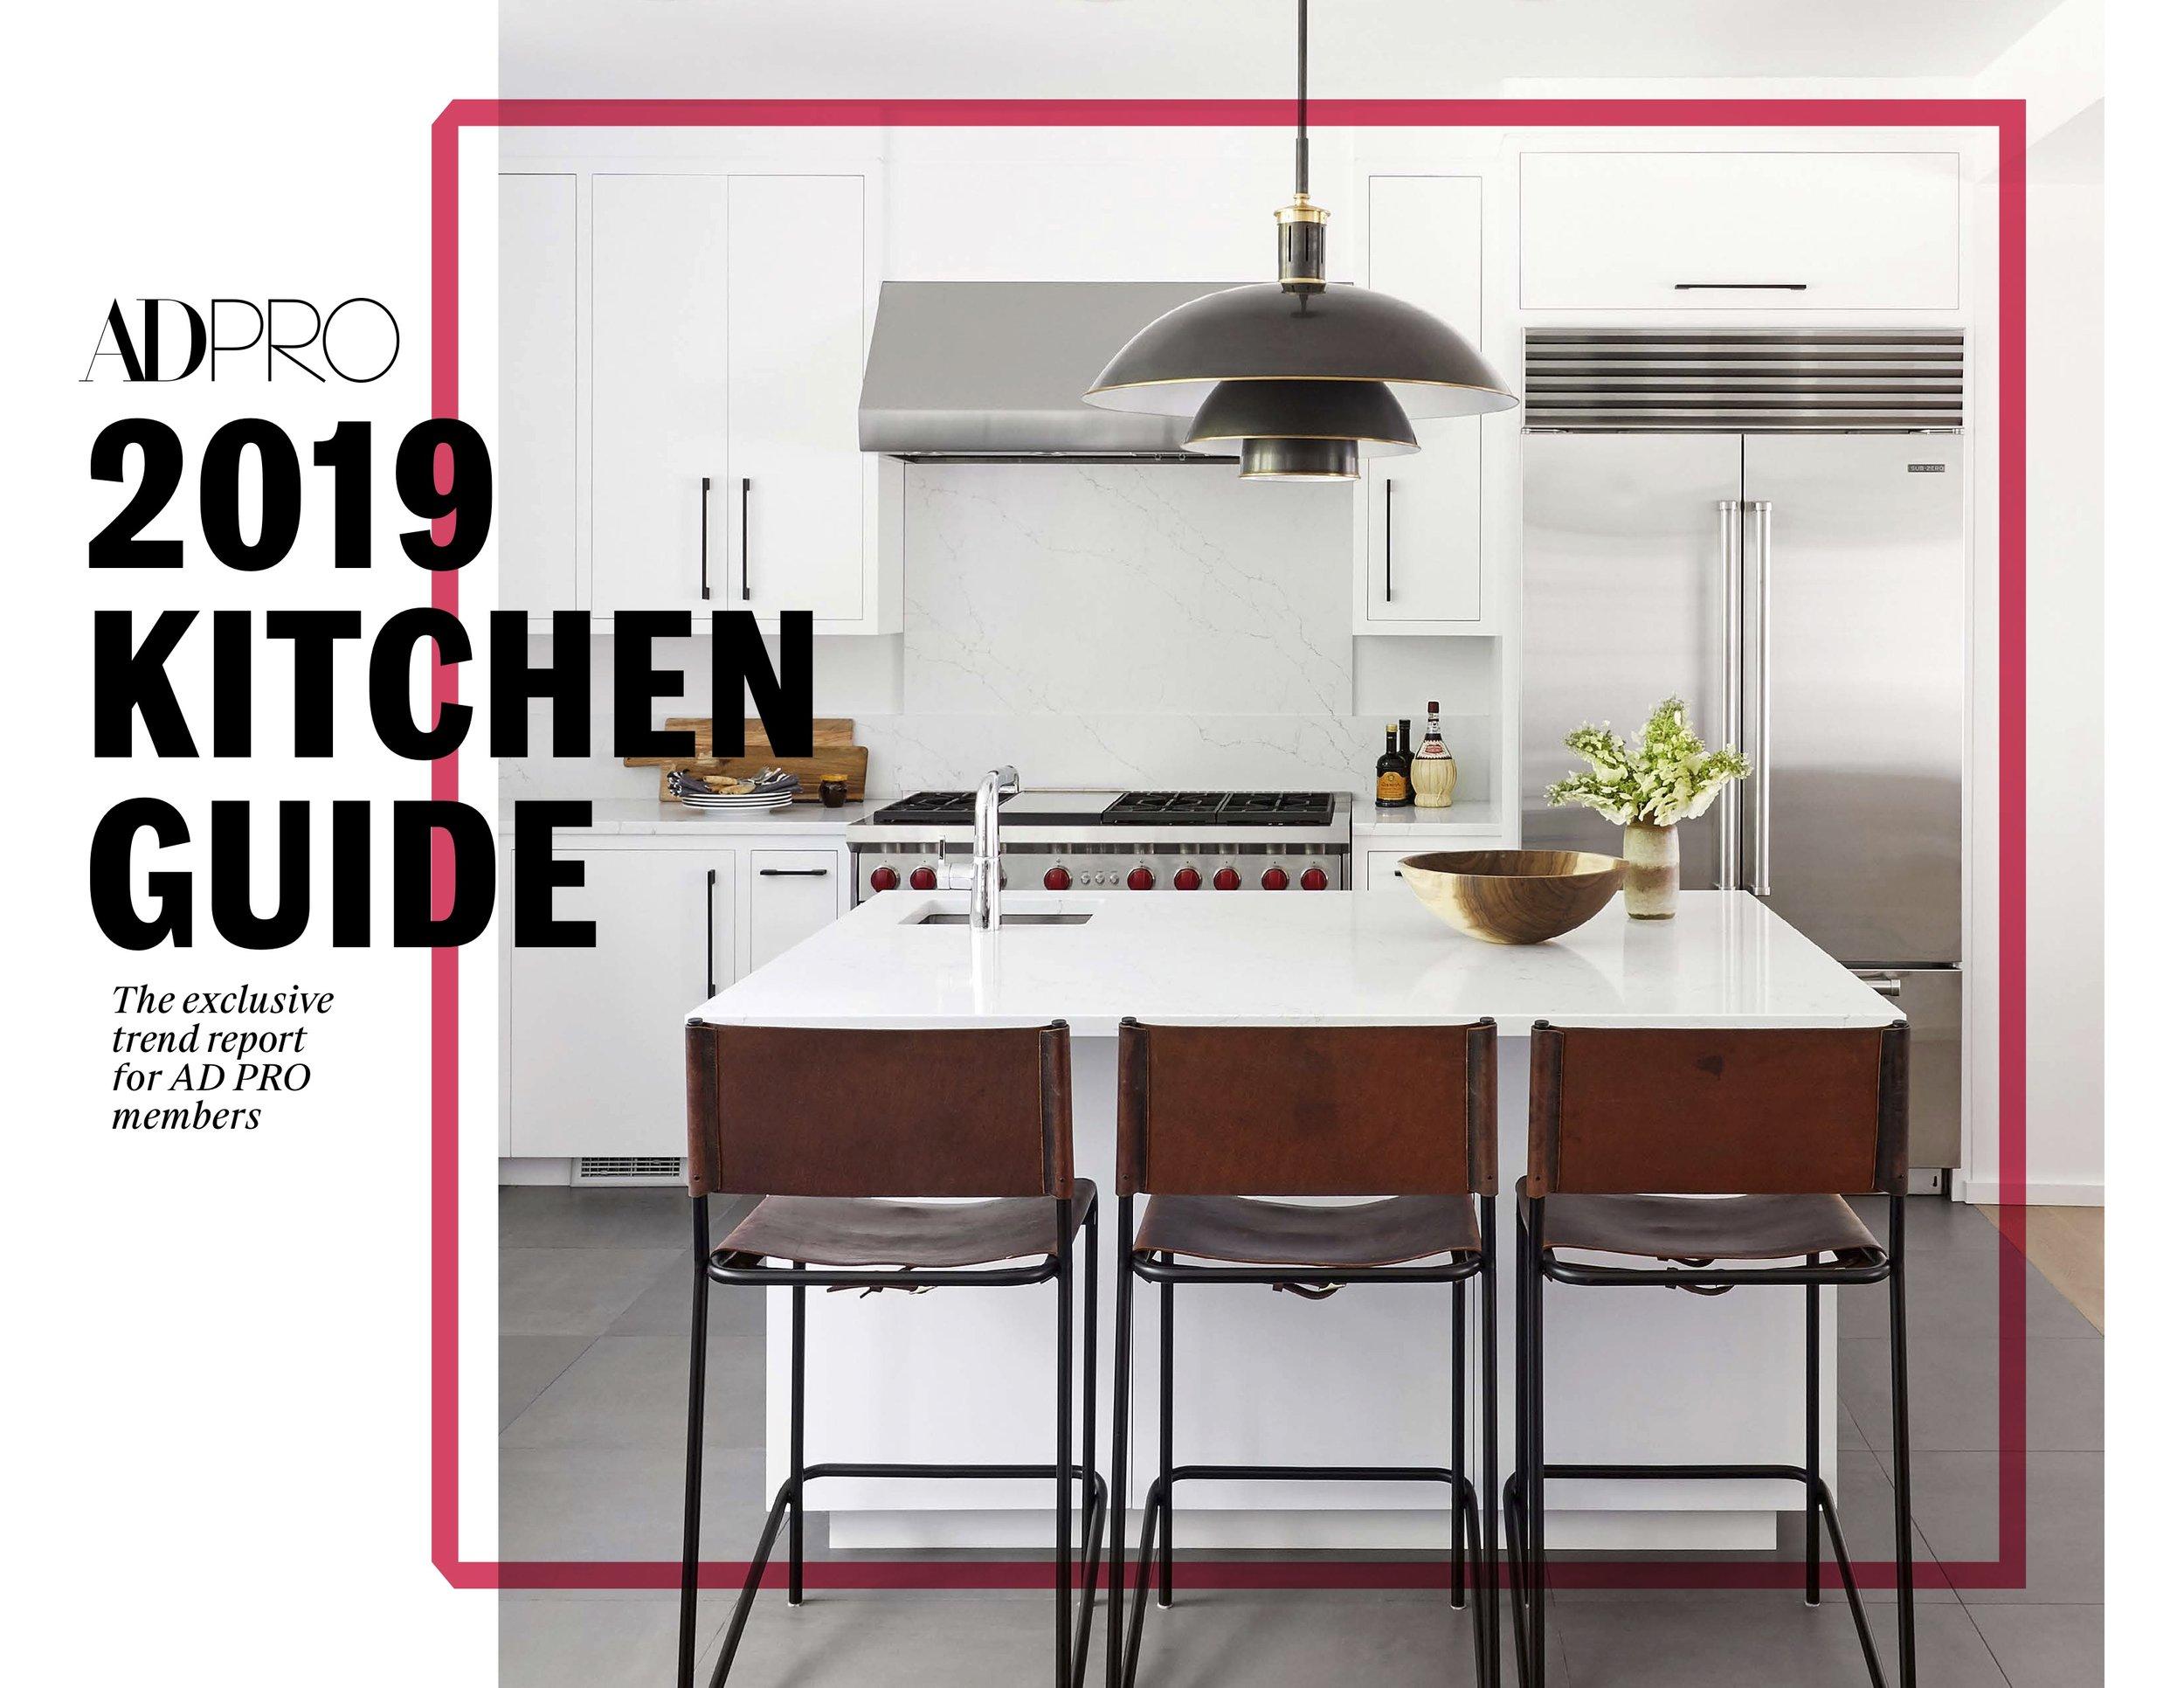 AD Pro kitchens 1.jpg